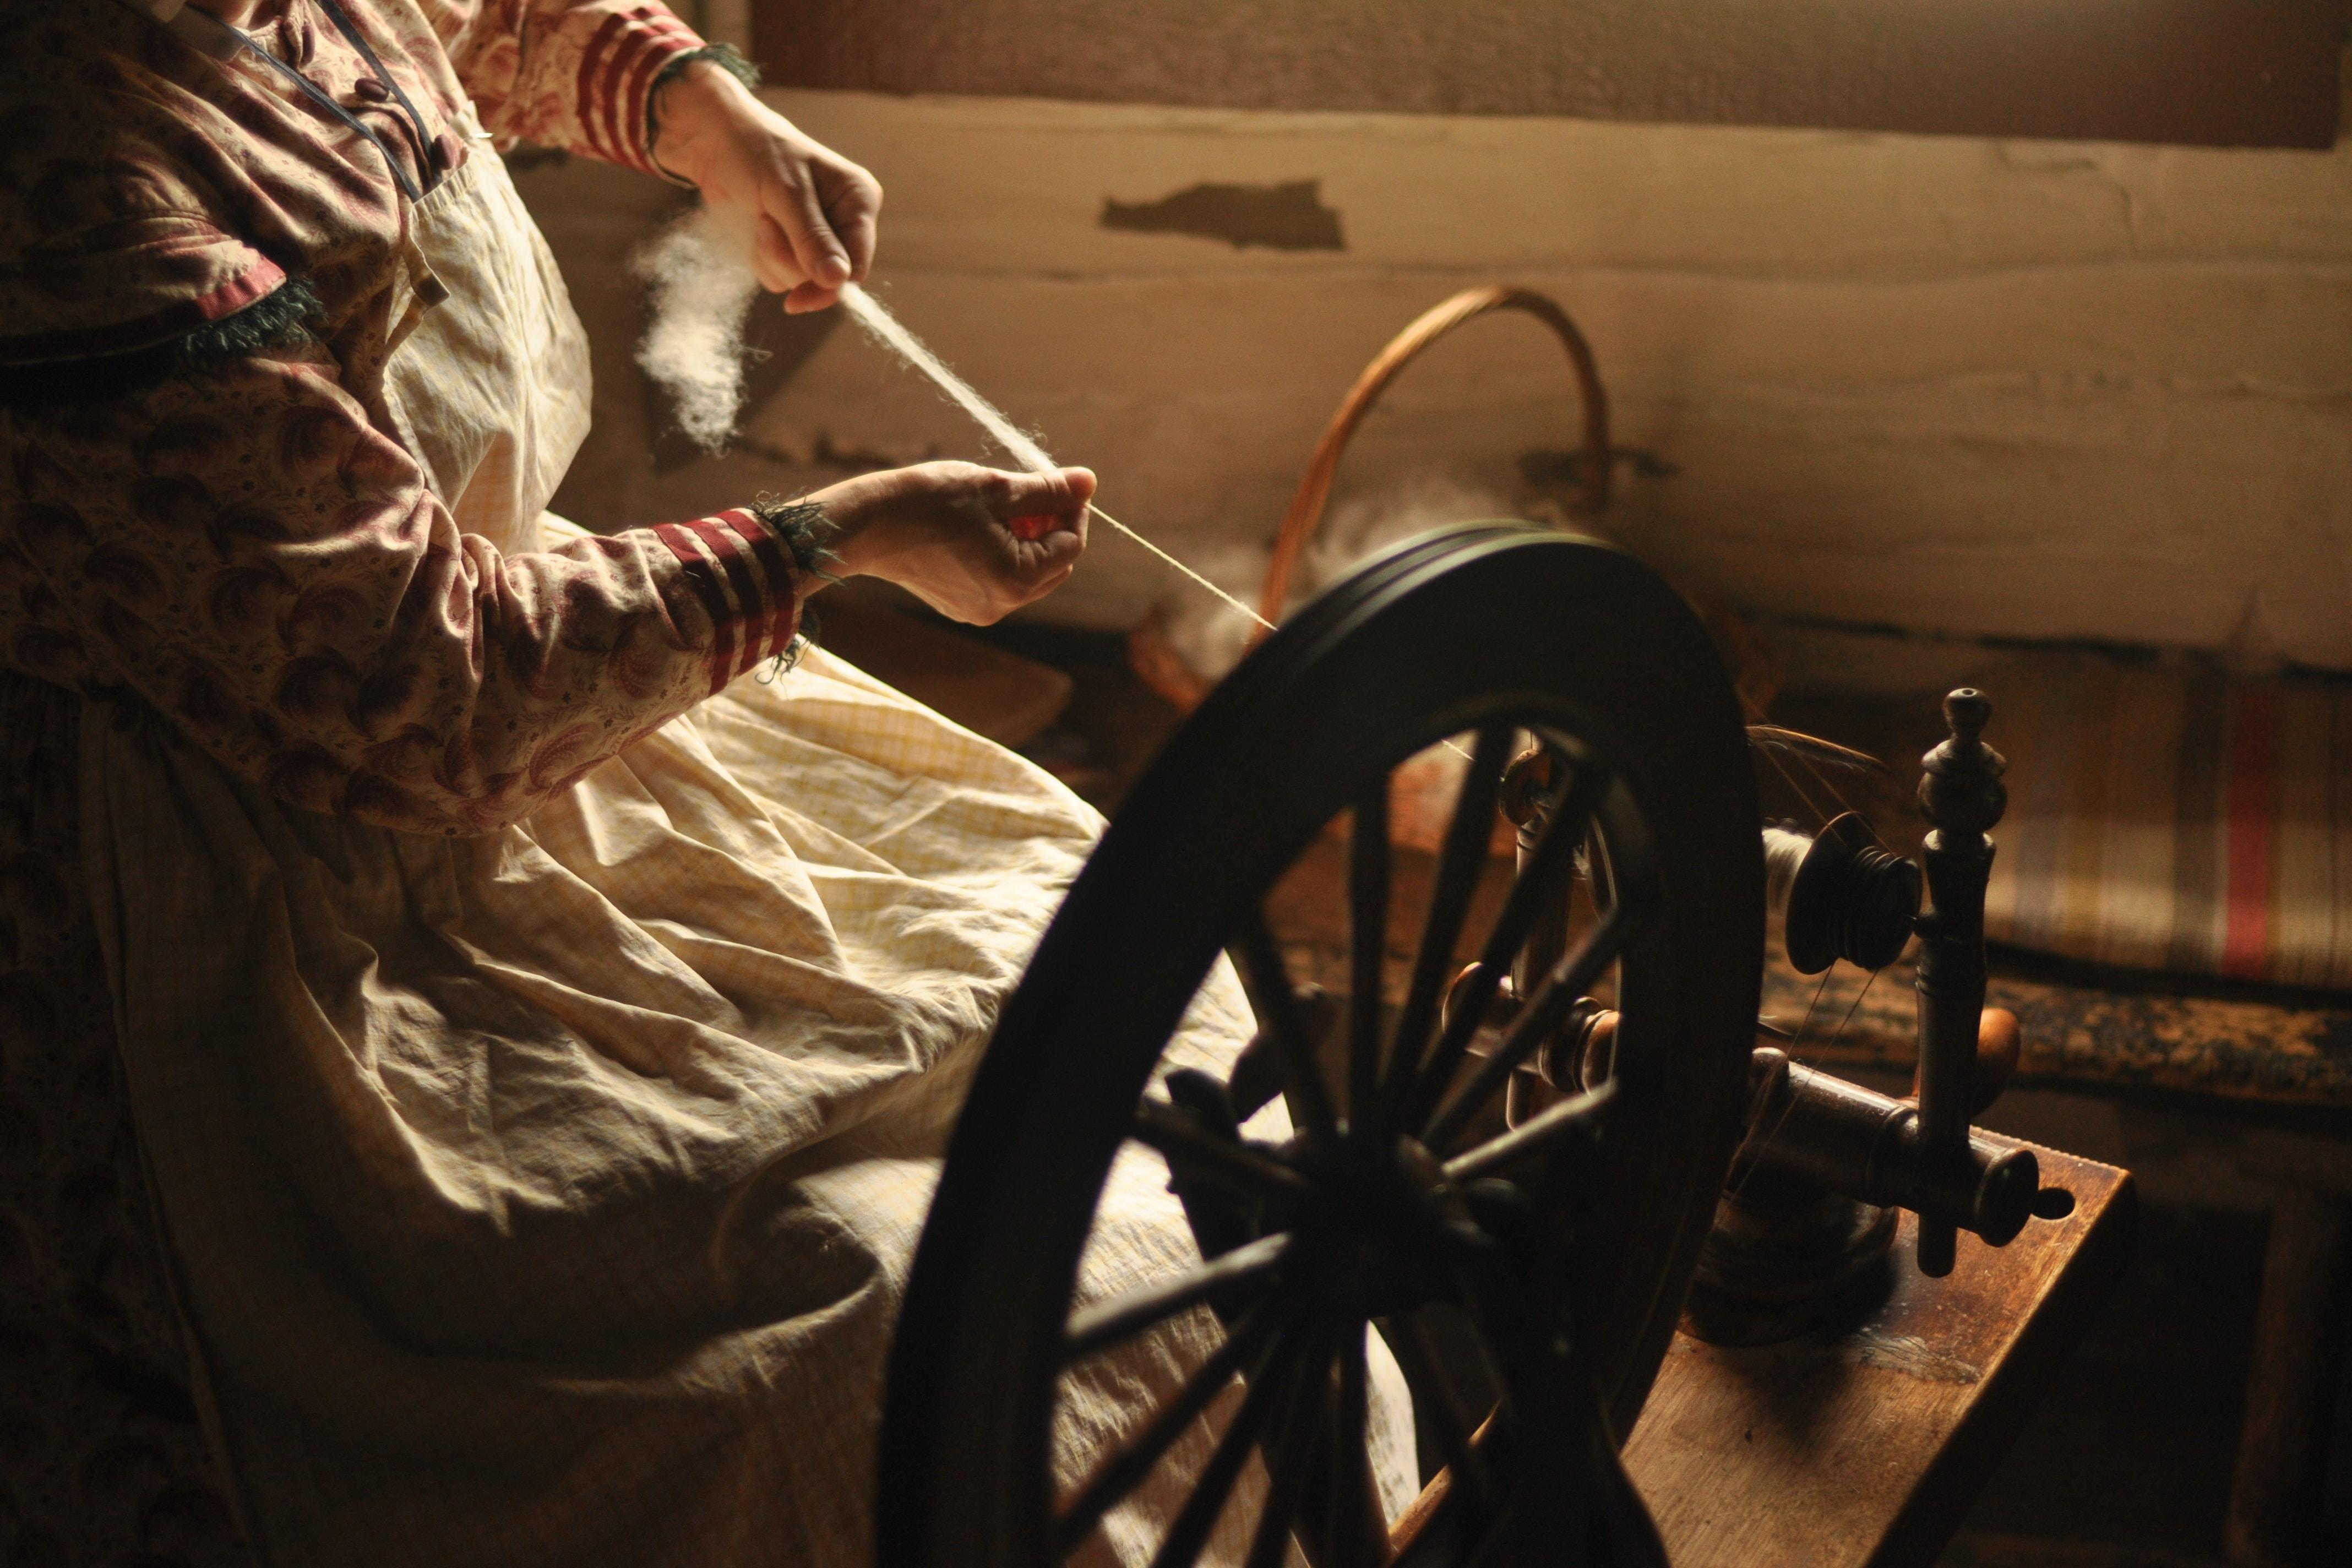 woman using spinning wheel